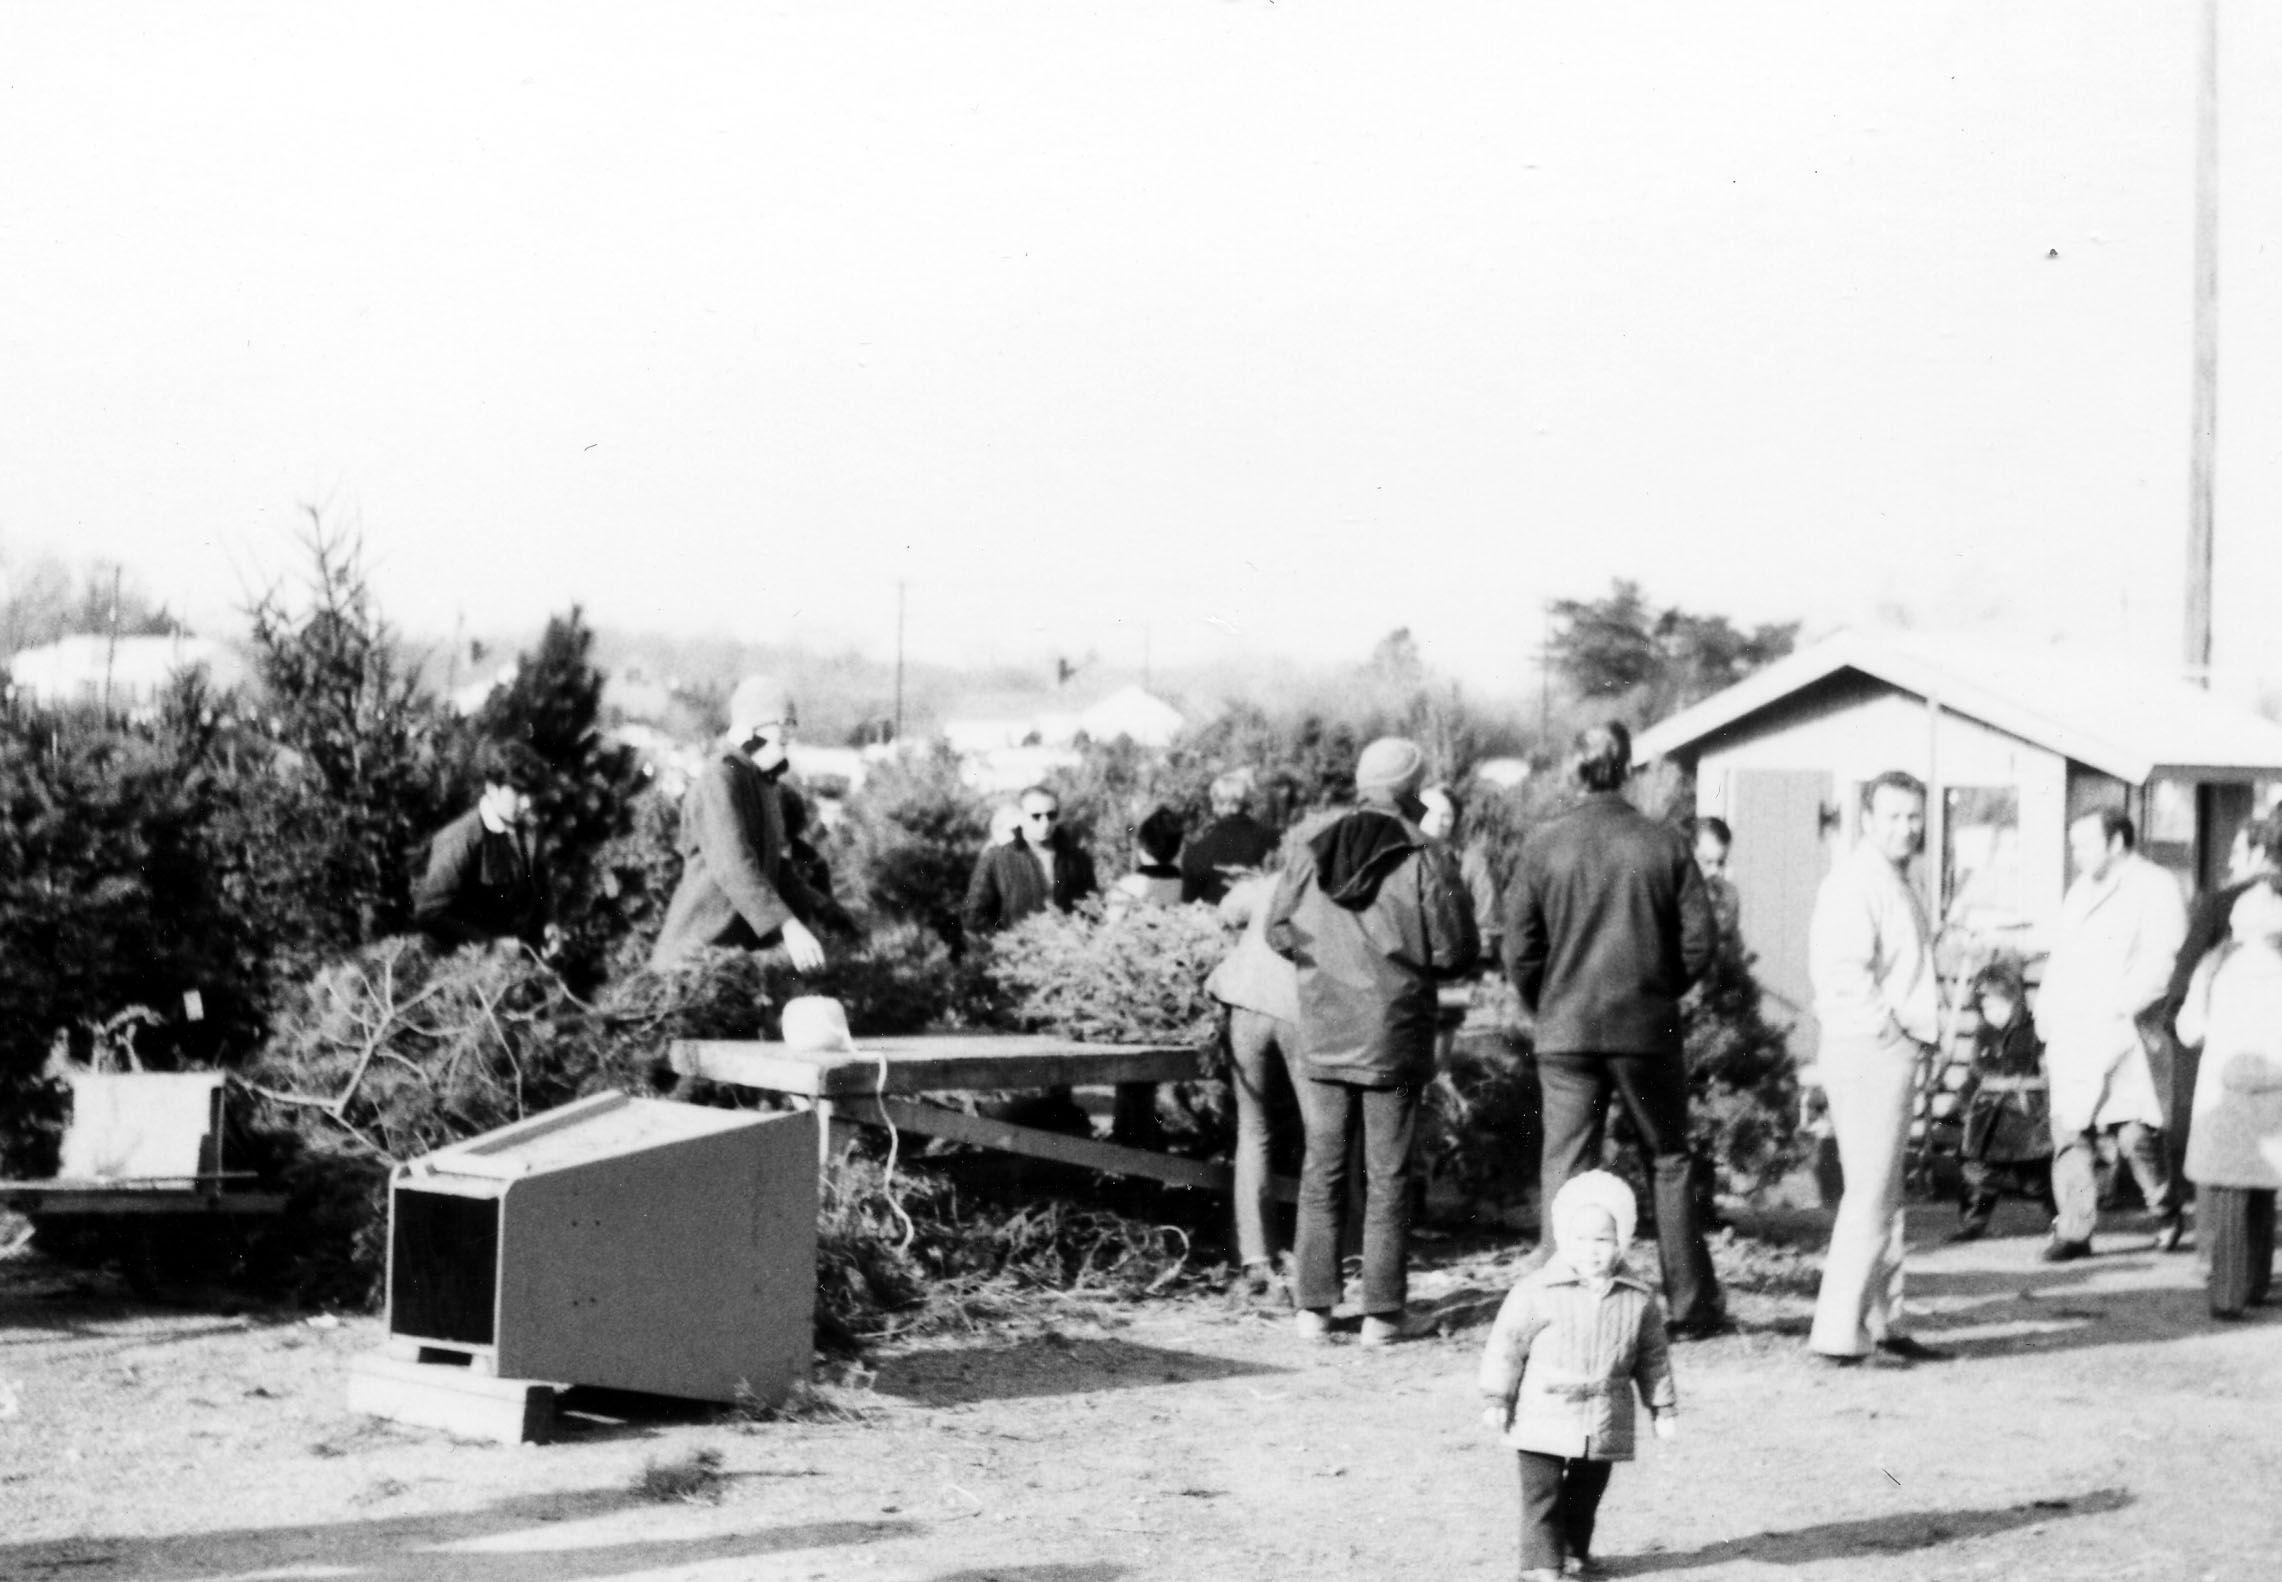 1971. Customers Christmas Trees. 160 Years Of